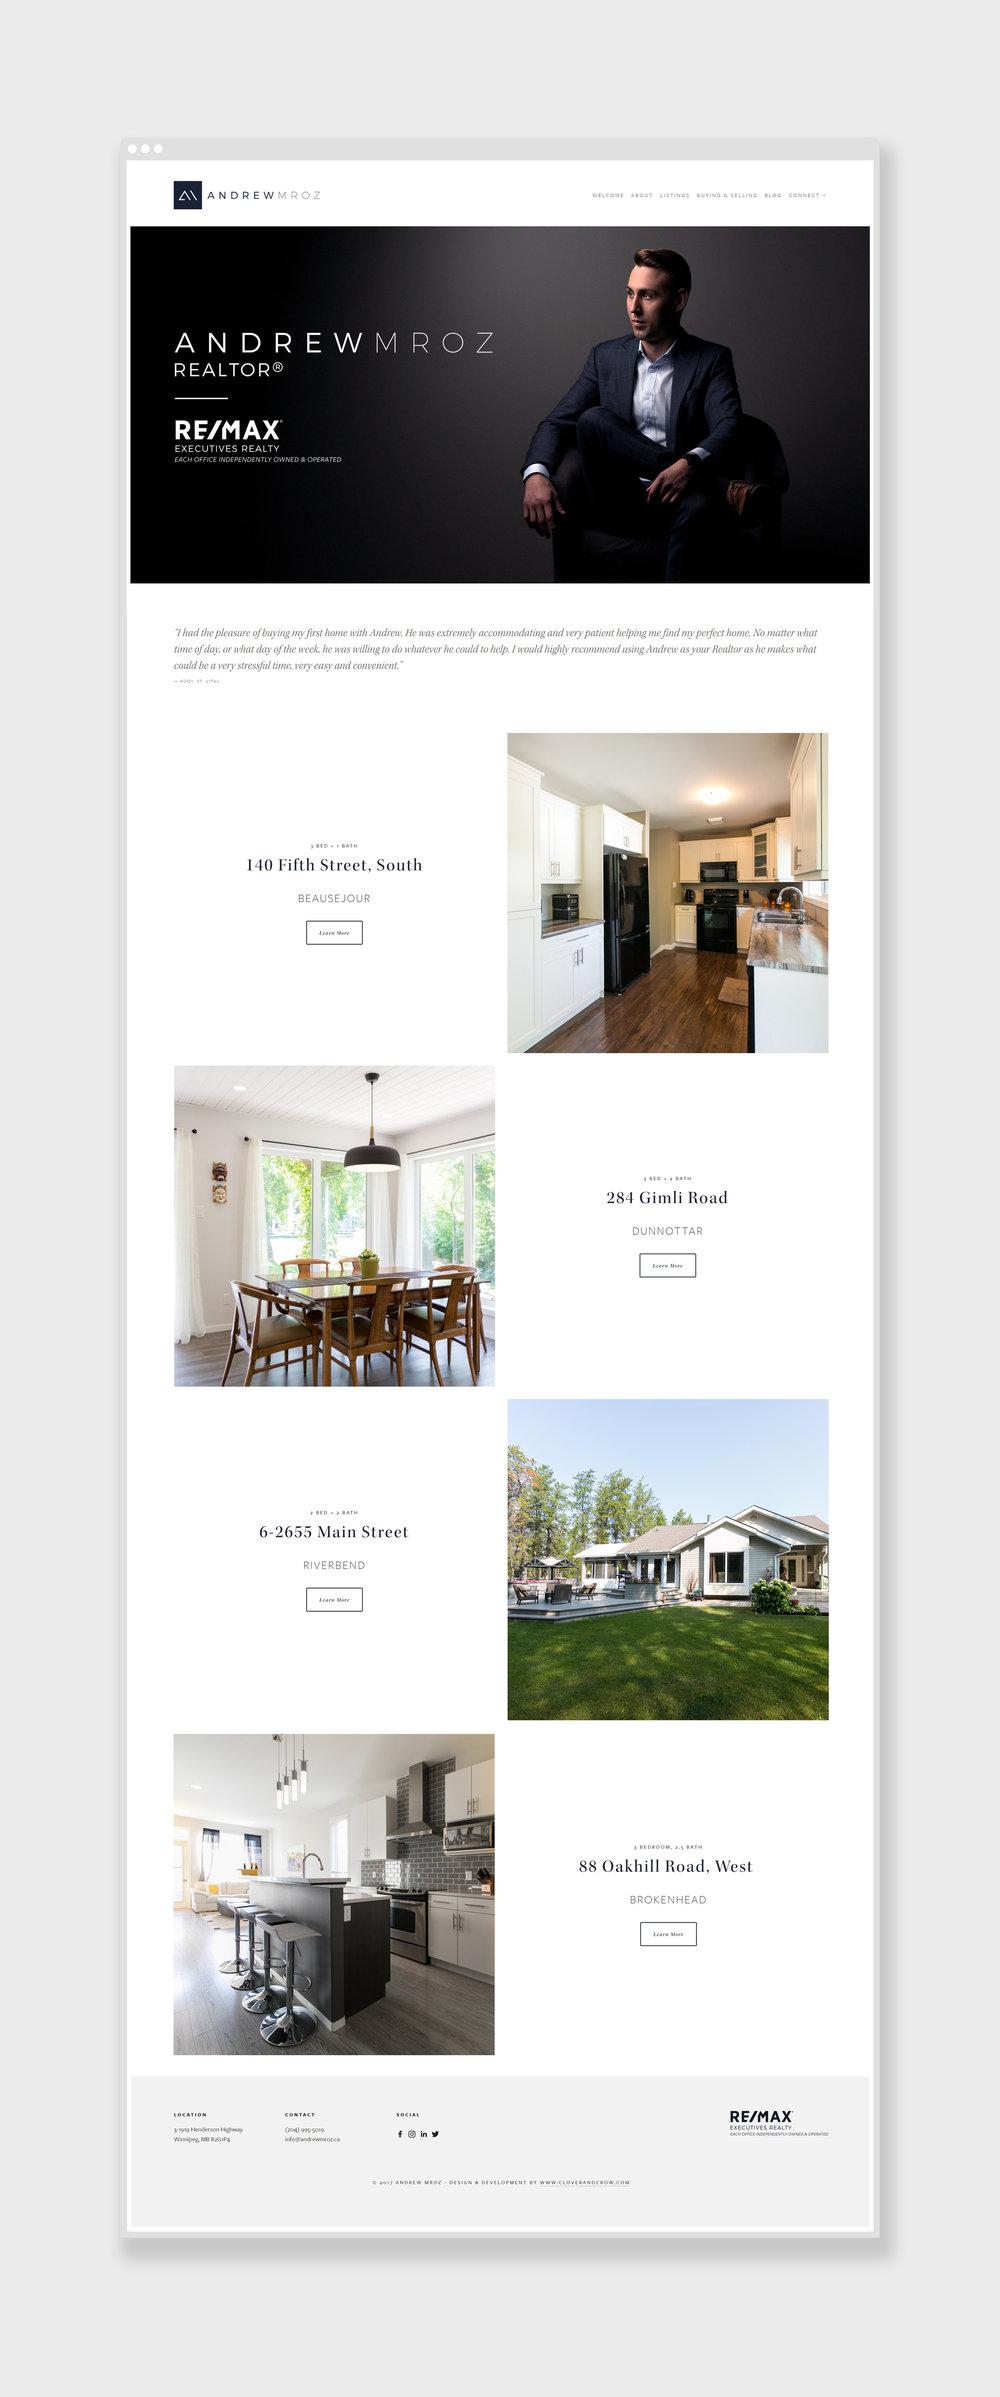 andrew-mroz-winnipeg-remax-branding-design-website-clover-and-crow